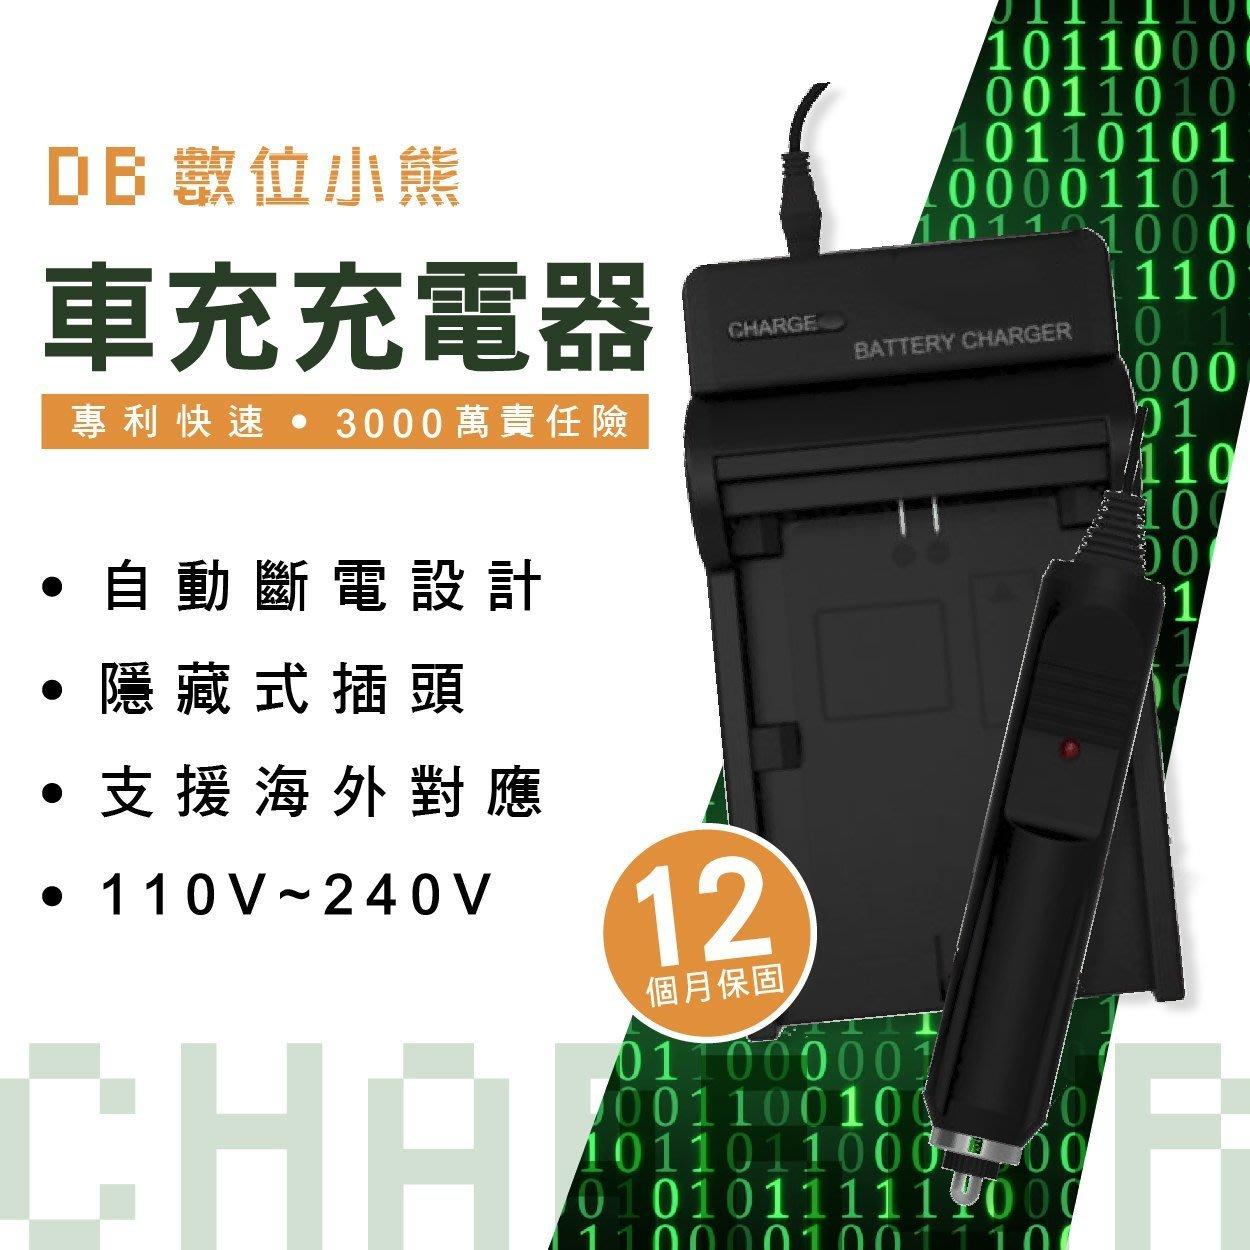 【數位小熊】FOR FUJI NP-150 車充 充電器 SL280 SL285 SL300 SL305 CB170